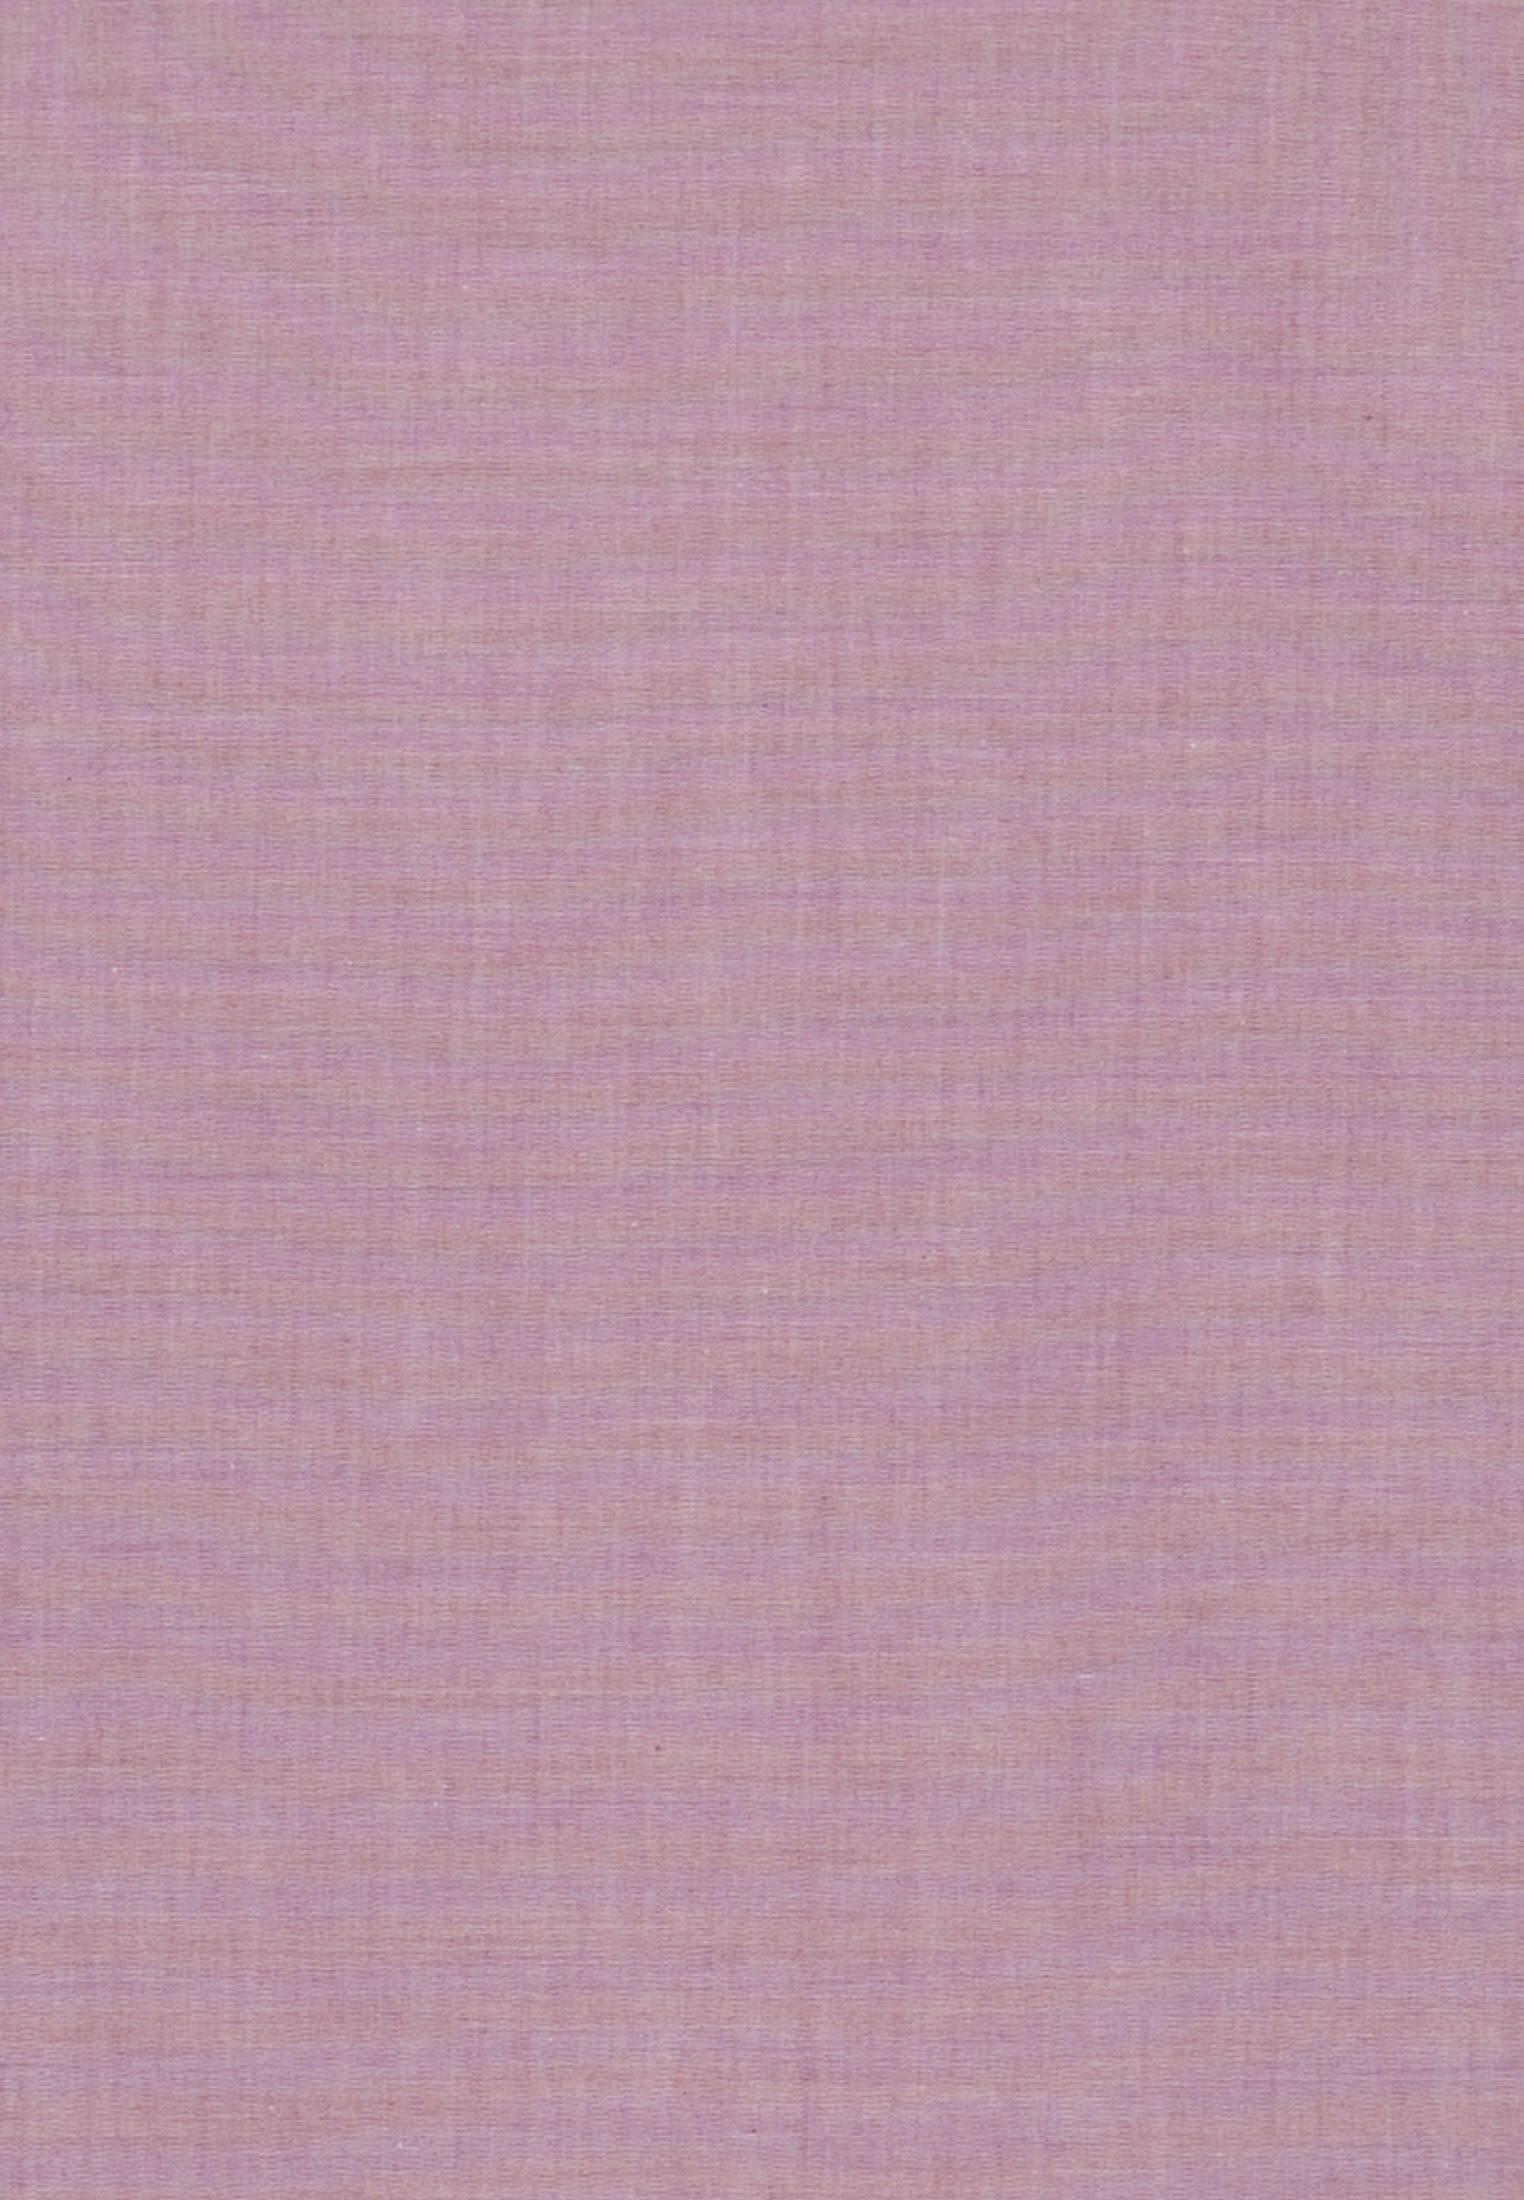 Bügelfreies Chambray Business Hemd in Comfort mit Kentkragen in Rot |  Seidensticker Onlineshop